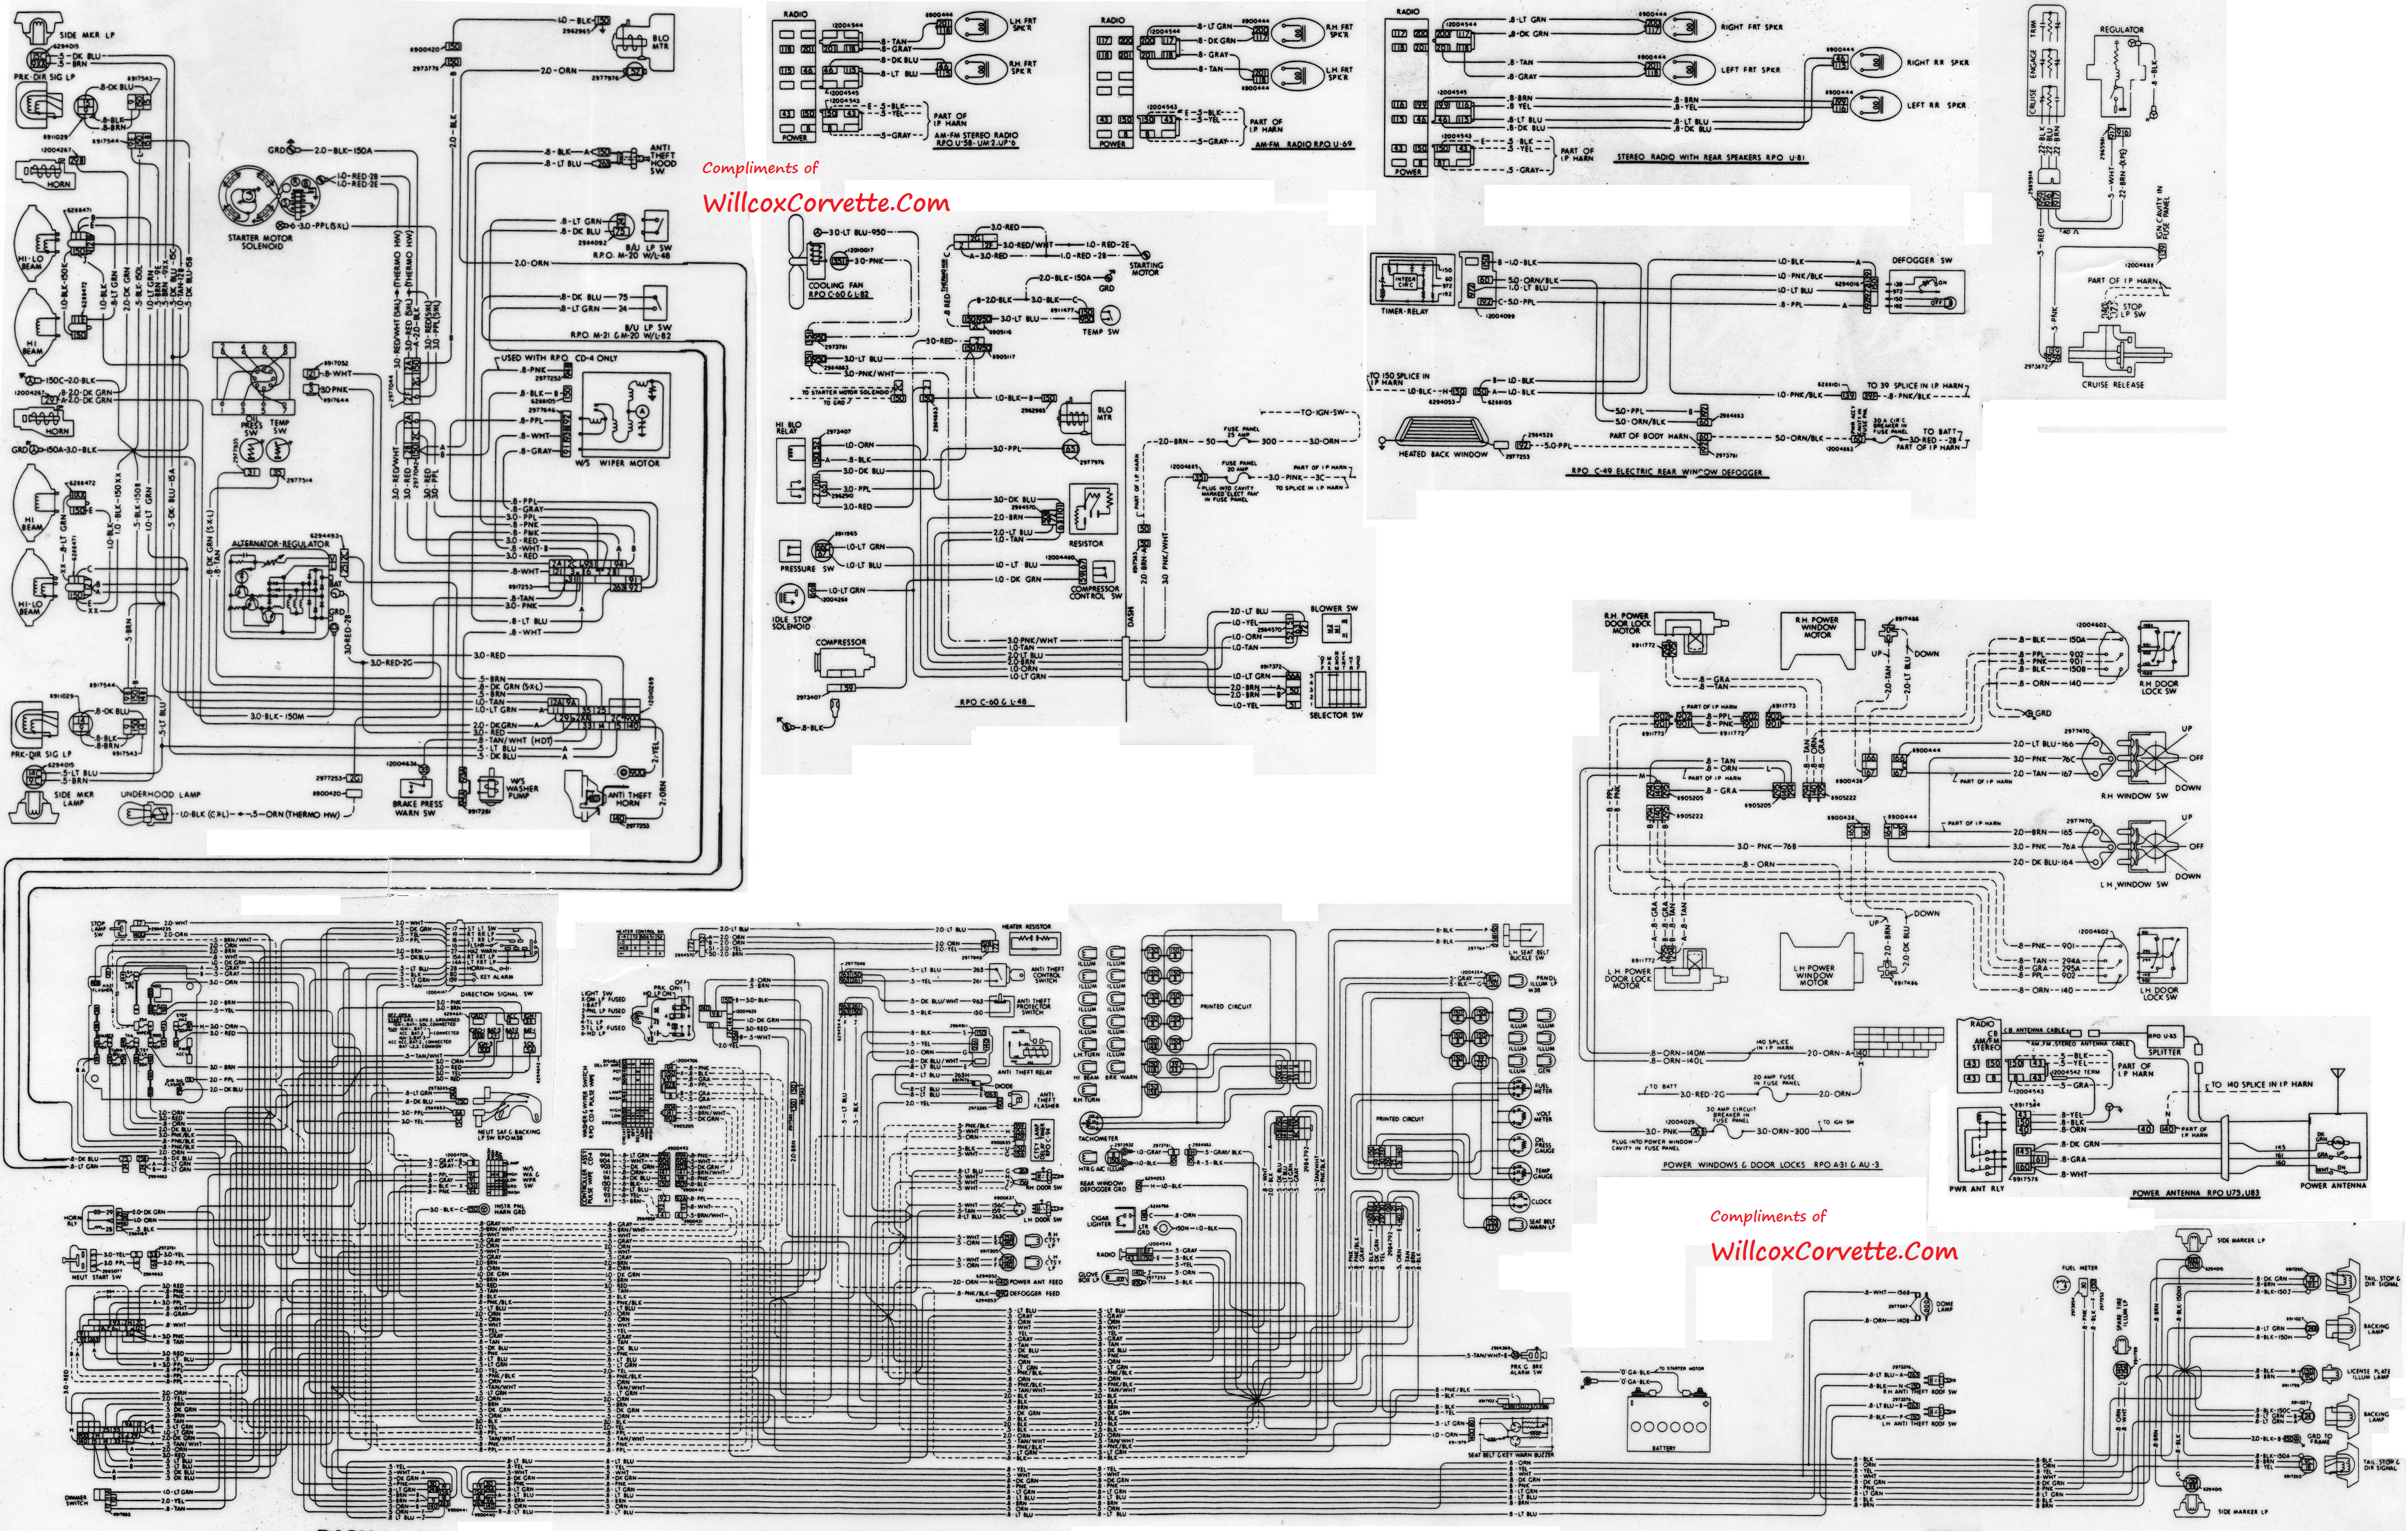 87 corvette wiring diagram free download c4 corvette wiring diagram over www tintenglueck de  c4 corvette wiring diagram over www